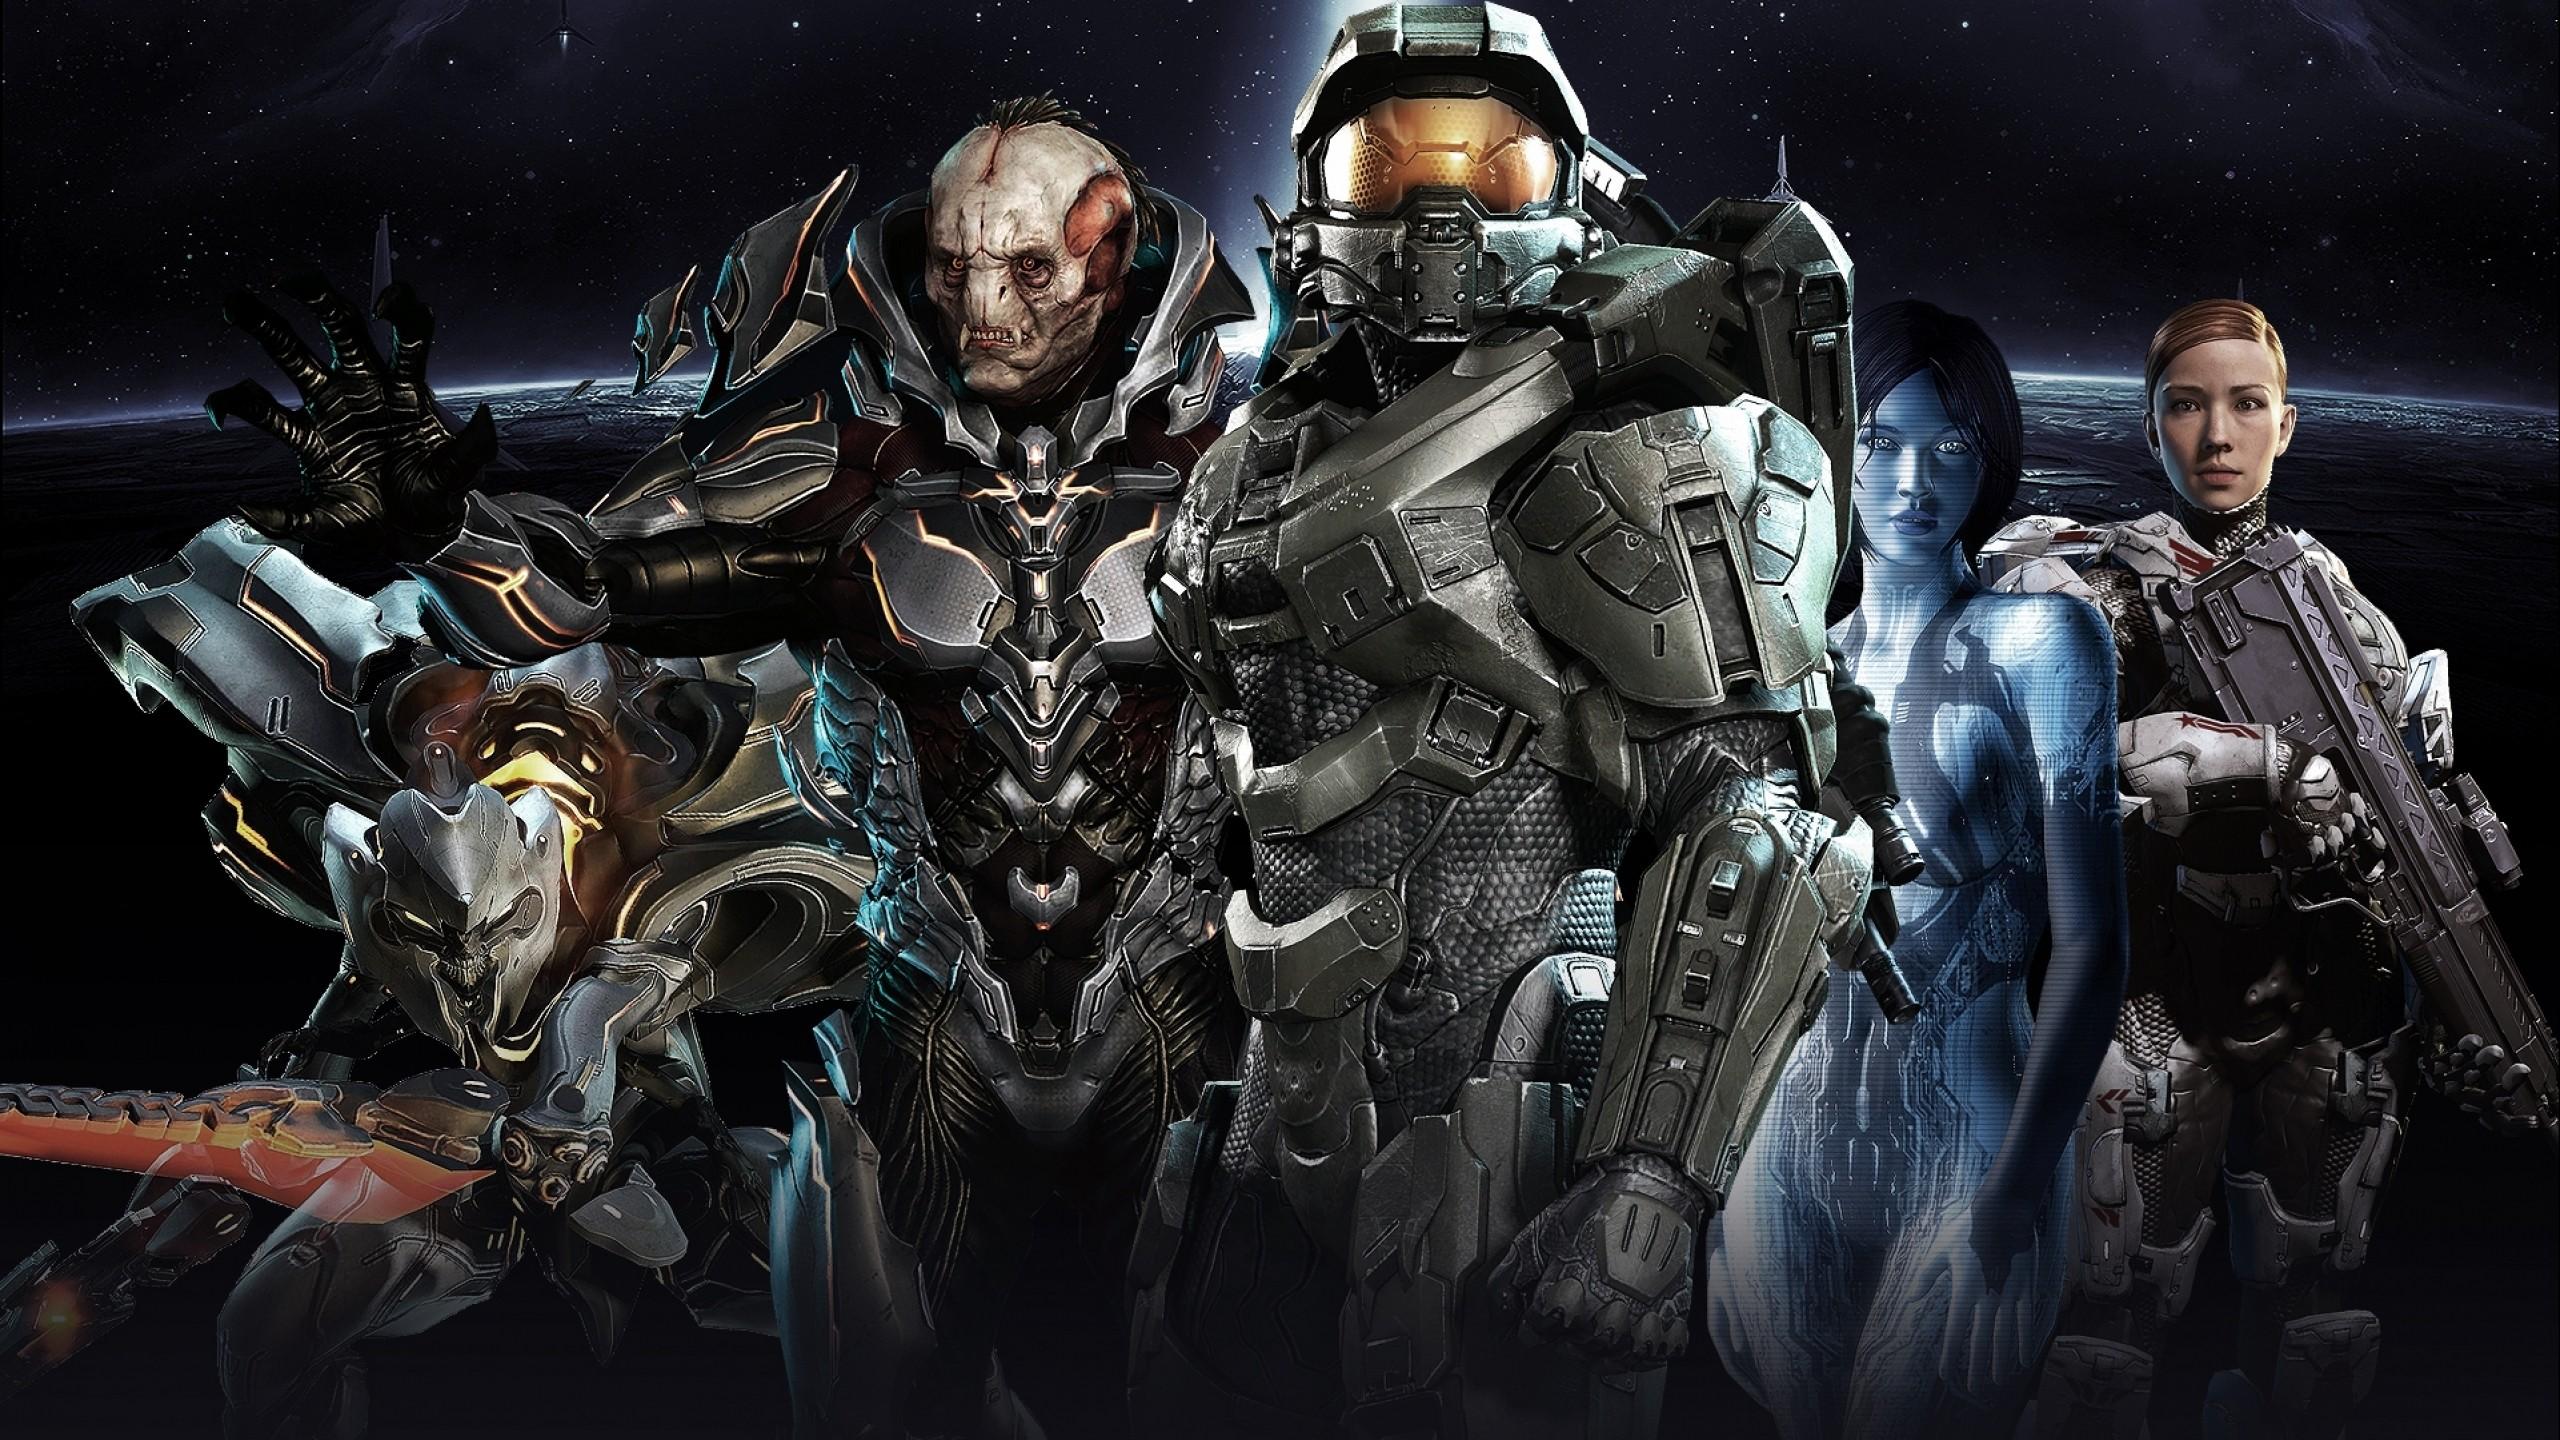 Wallpaper Video Games Machine Master Chief Xbox One Halo